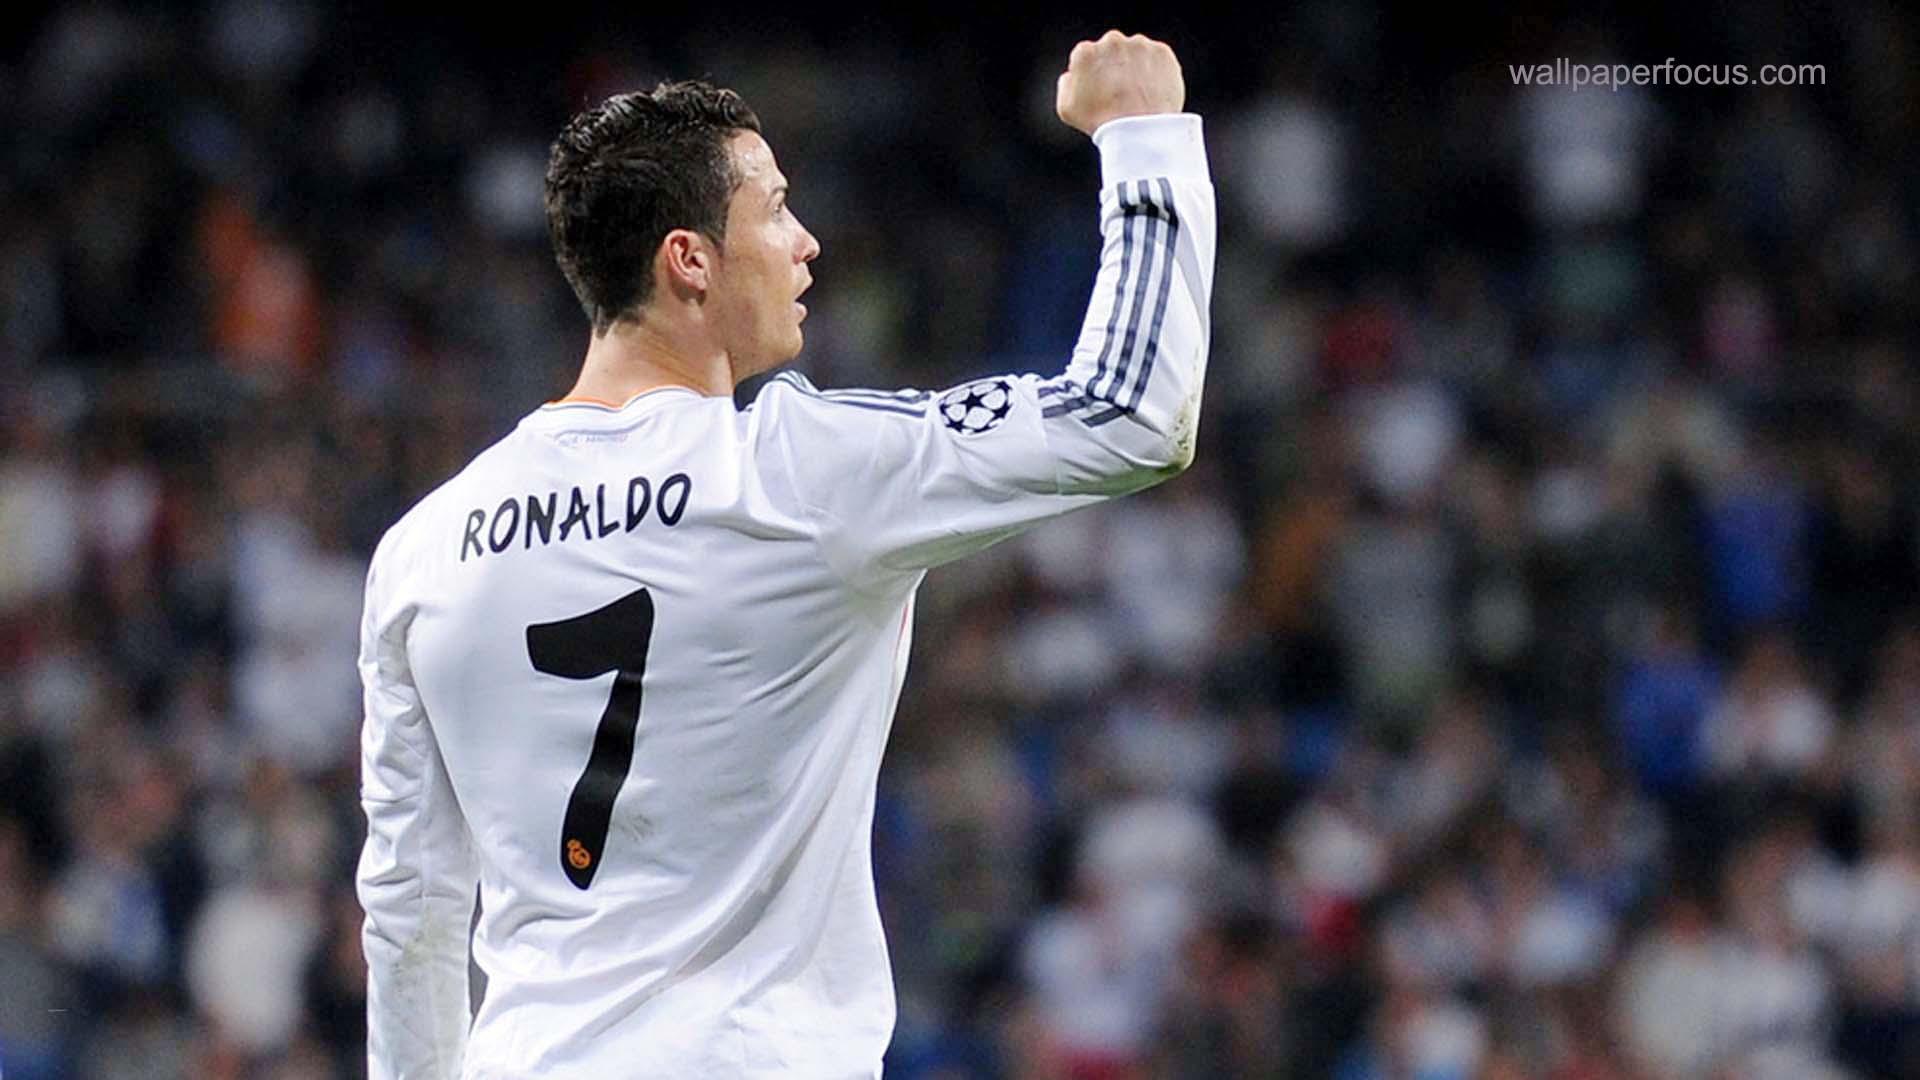 FunMozar Cristiano Ronaldo Wallpapers Part 2 1920x1080